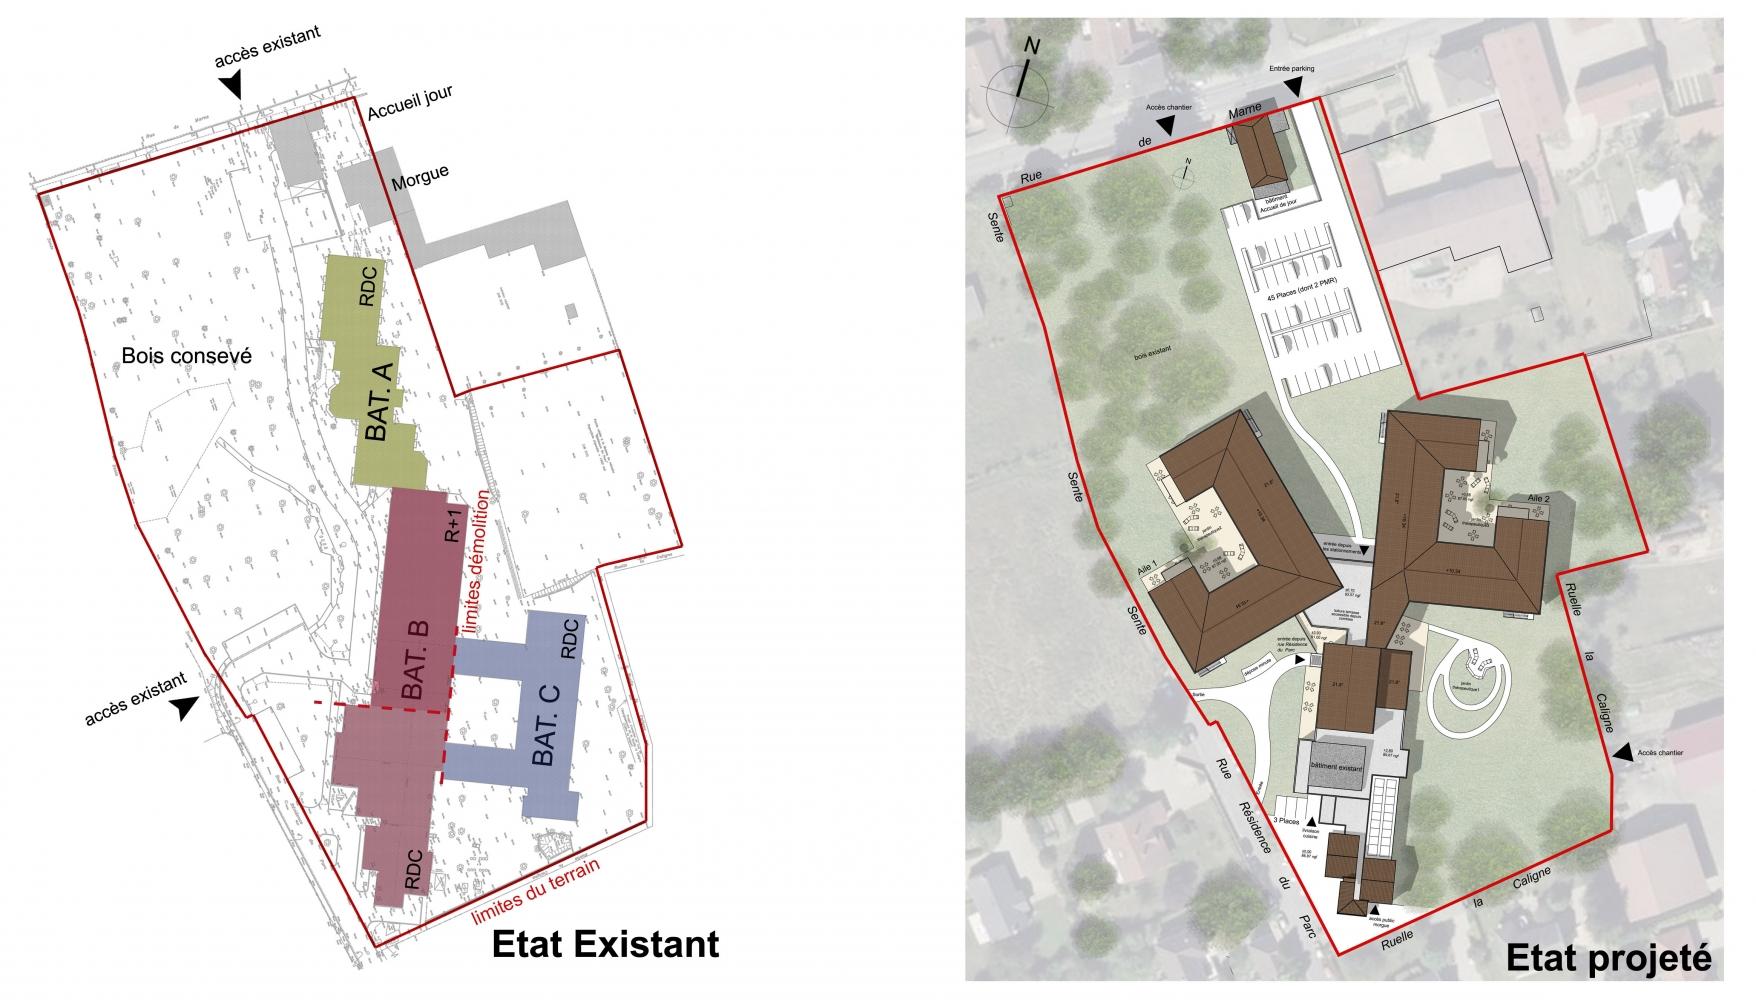 01-st-germain-img-001 Pascale SEURIN Architecte - Médico-Social